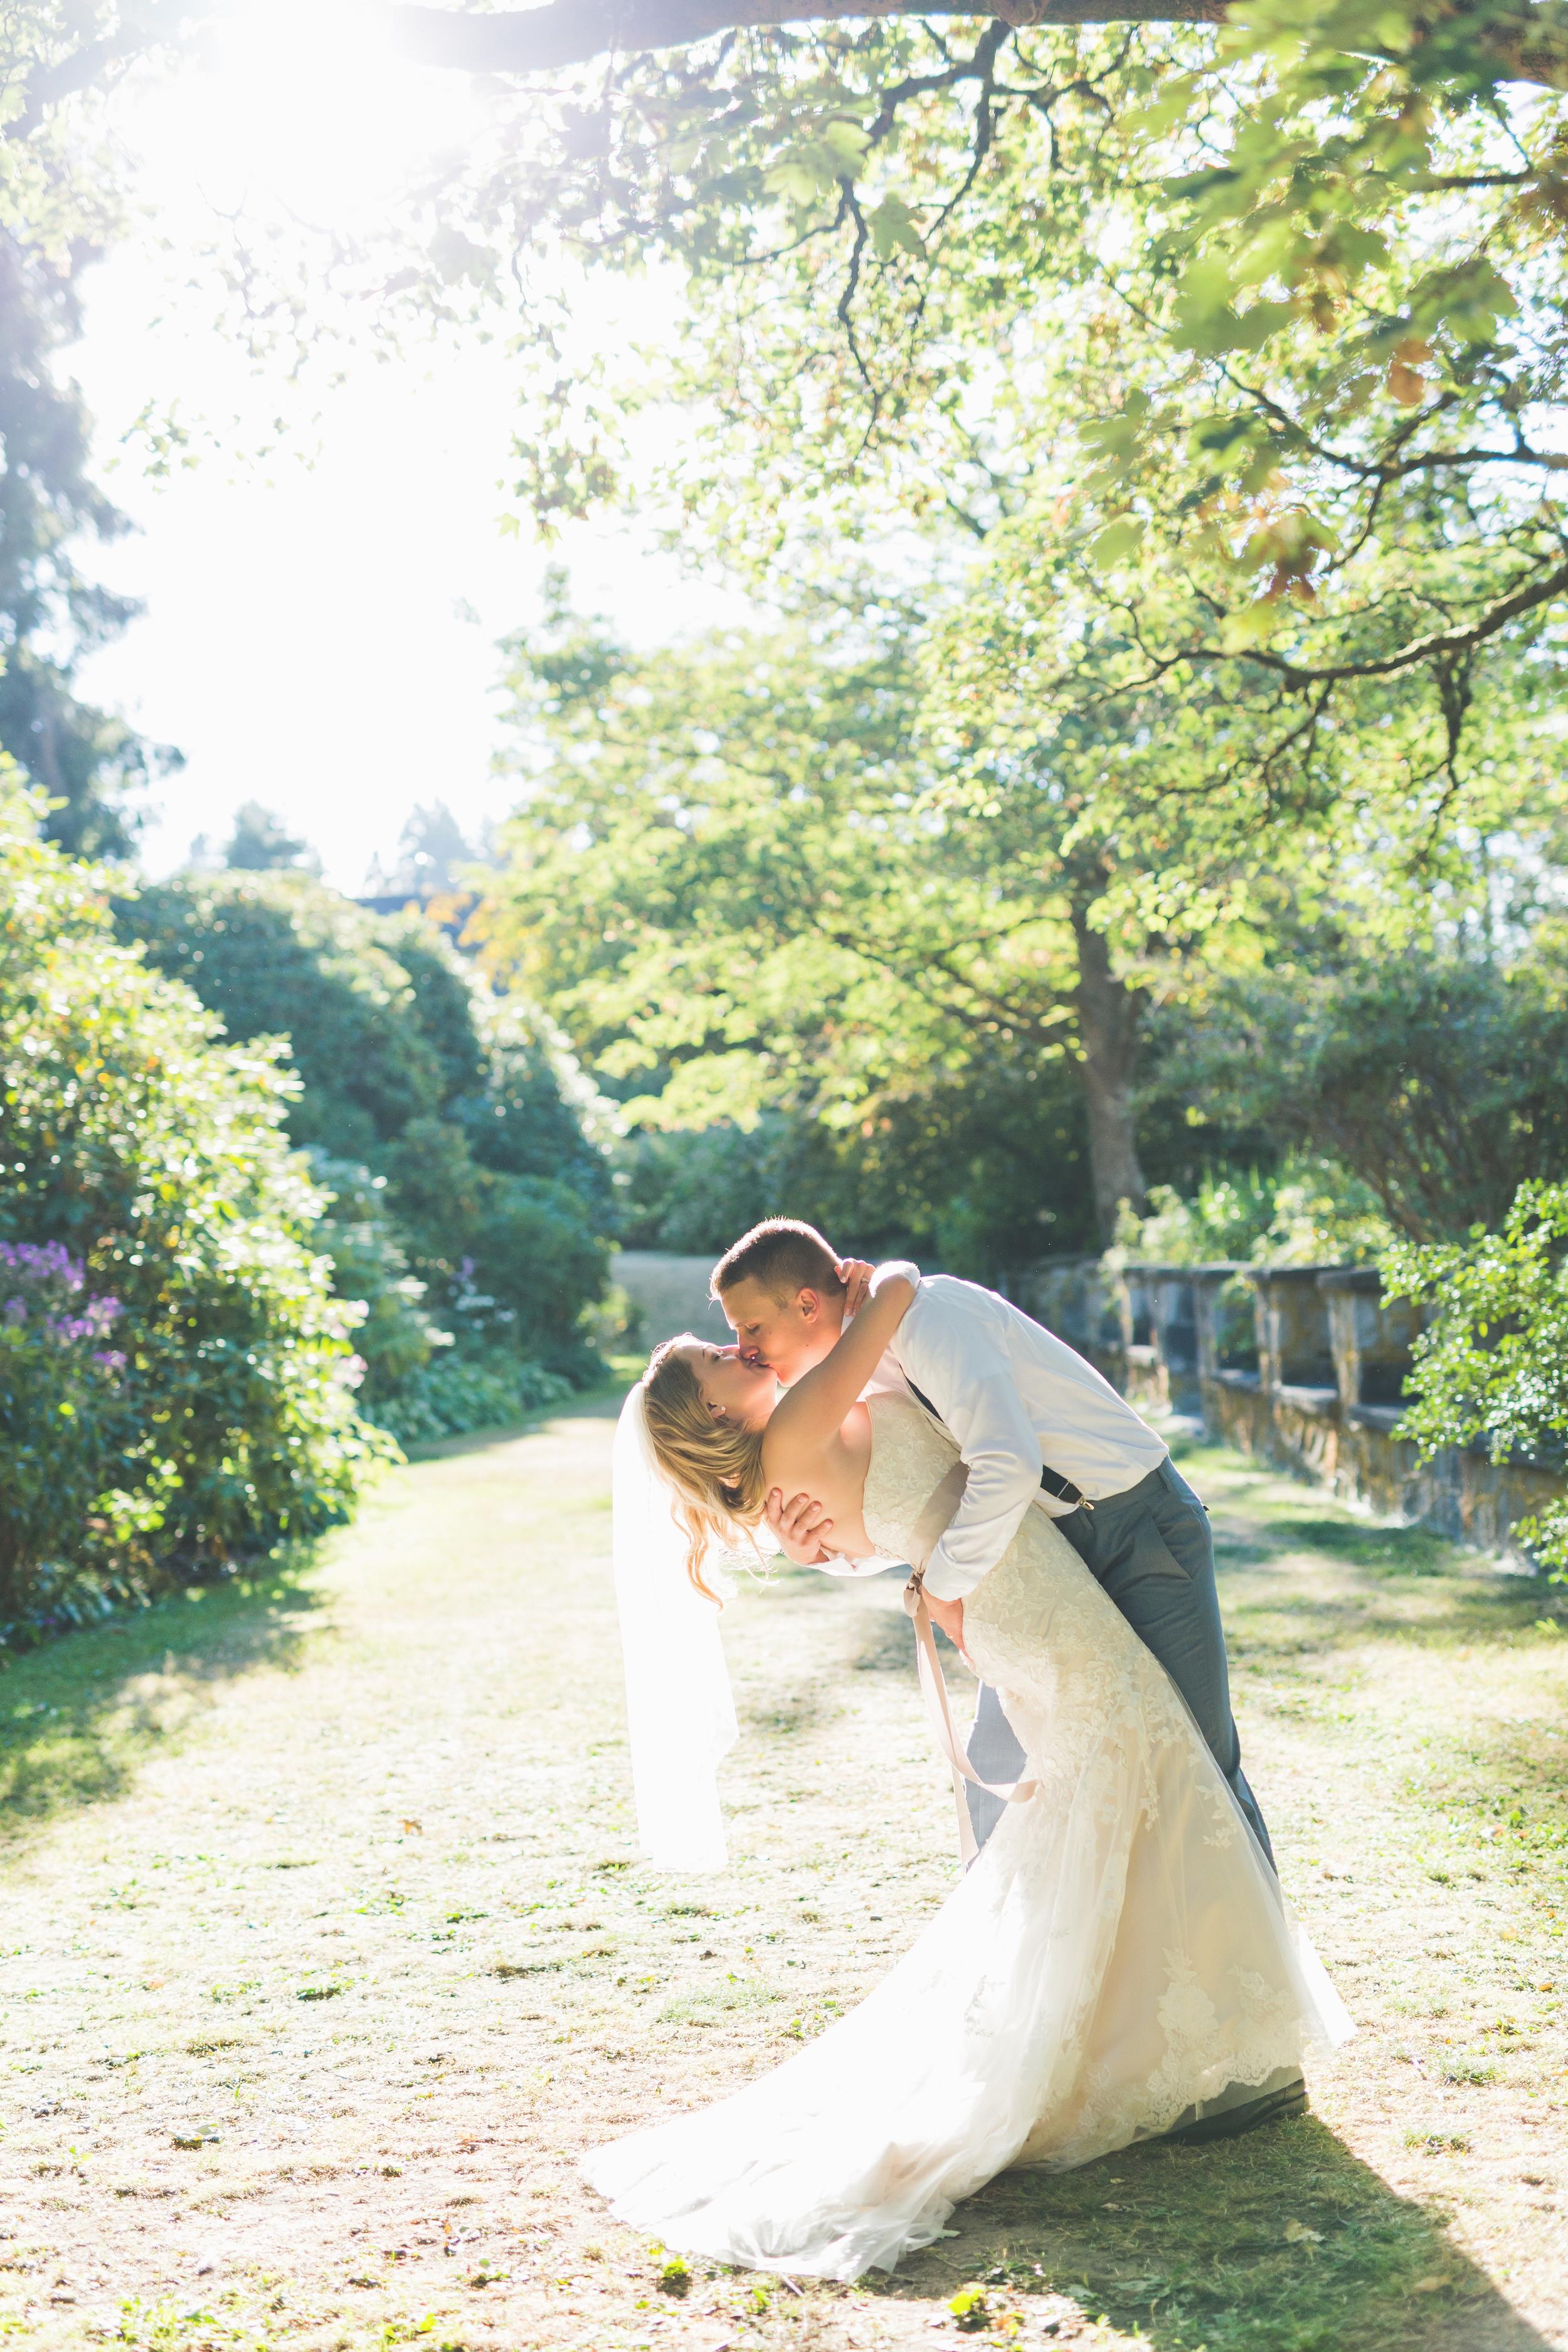 Vancouver Wedding Photographer, Jennifer Picard Photography, Aberthau Mansion Wedding Photographer